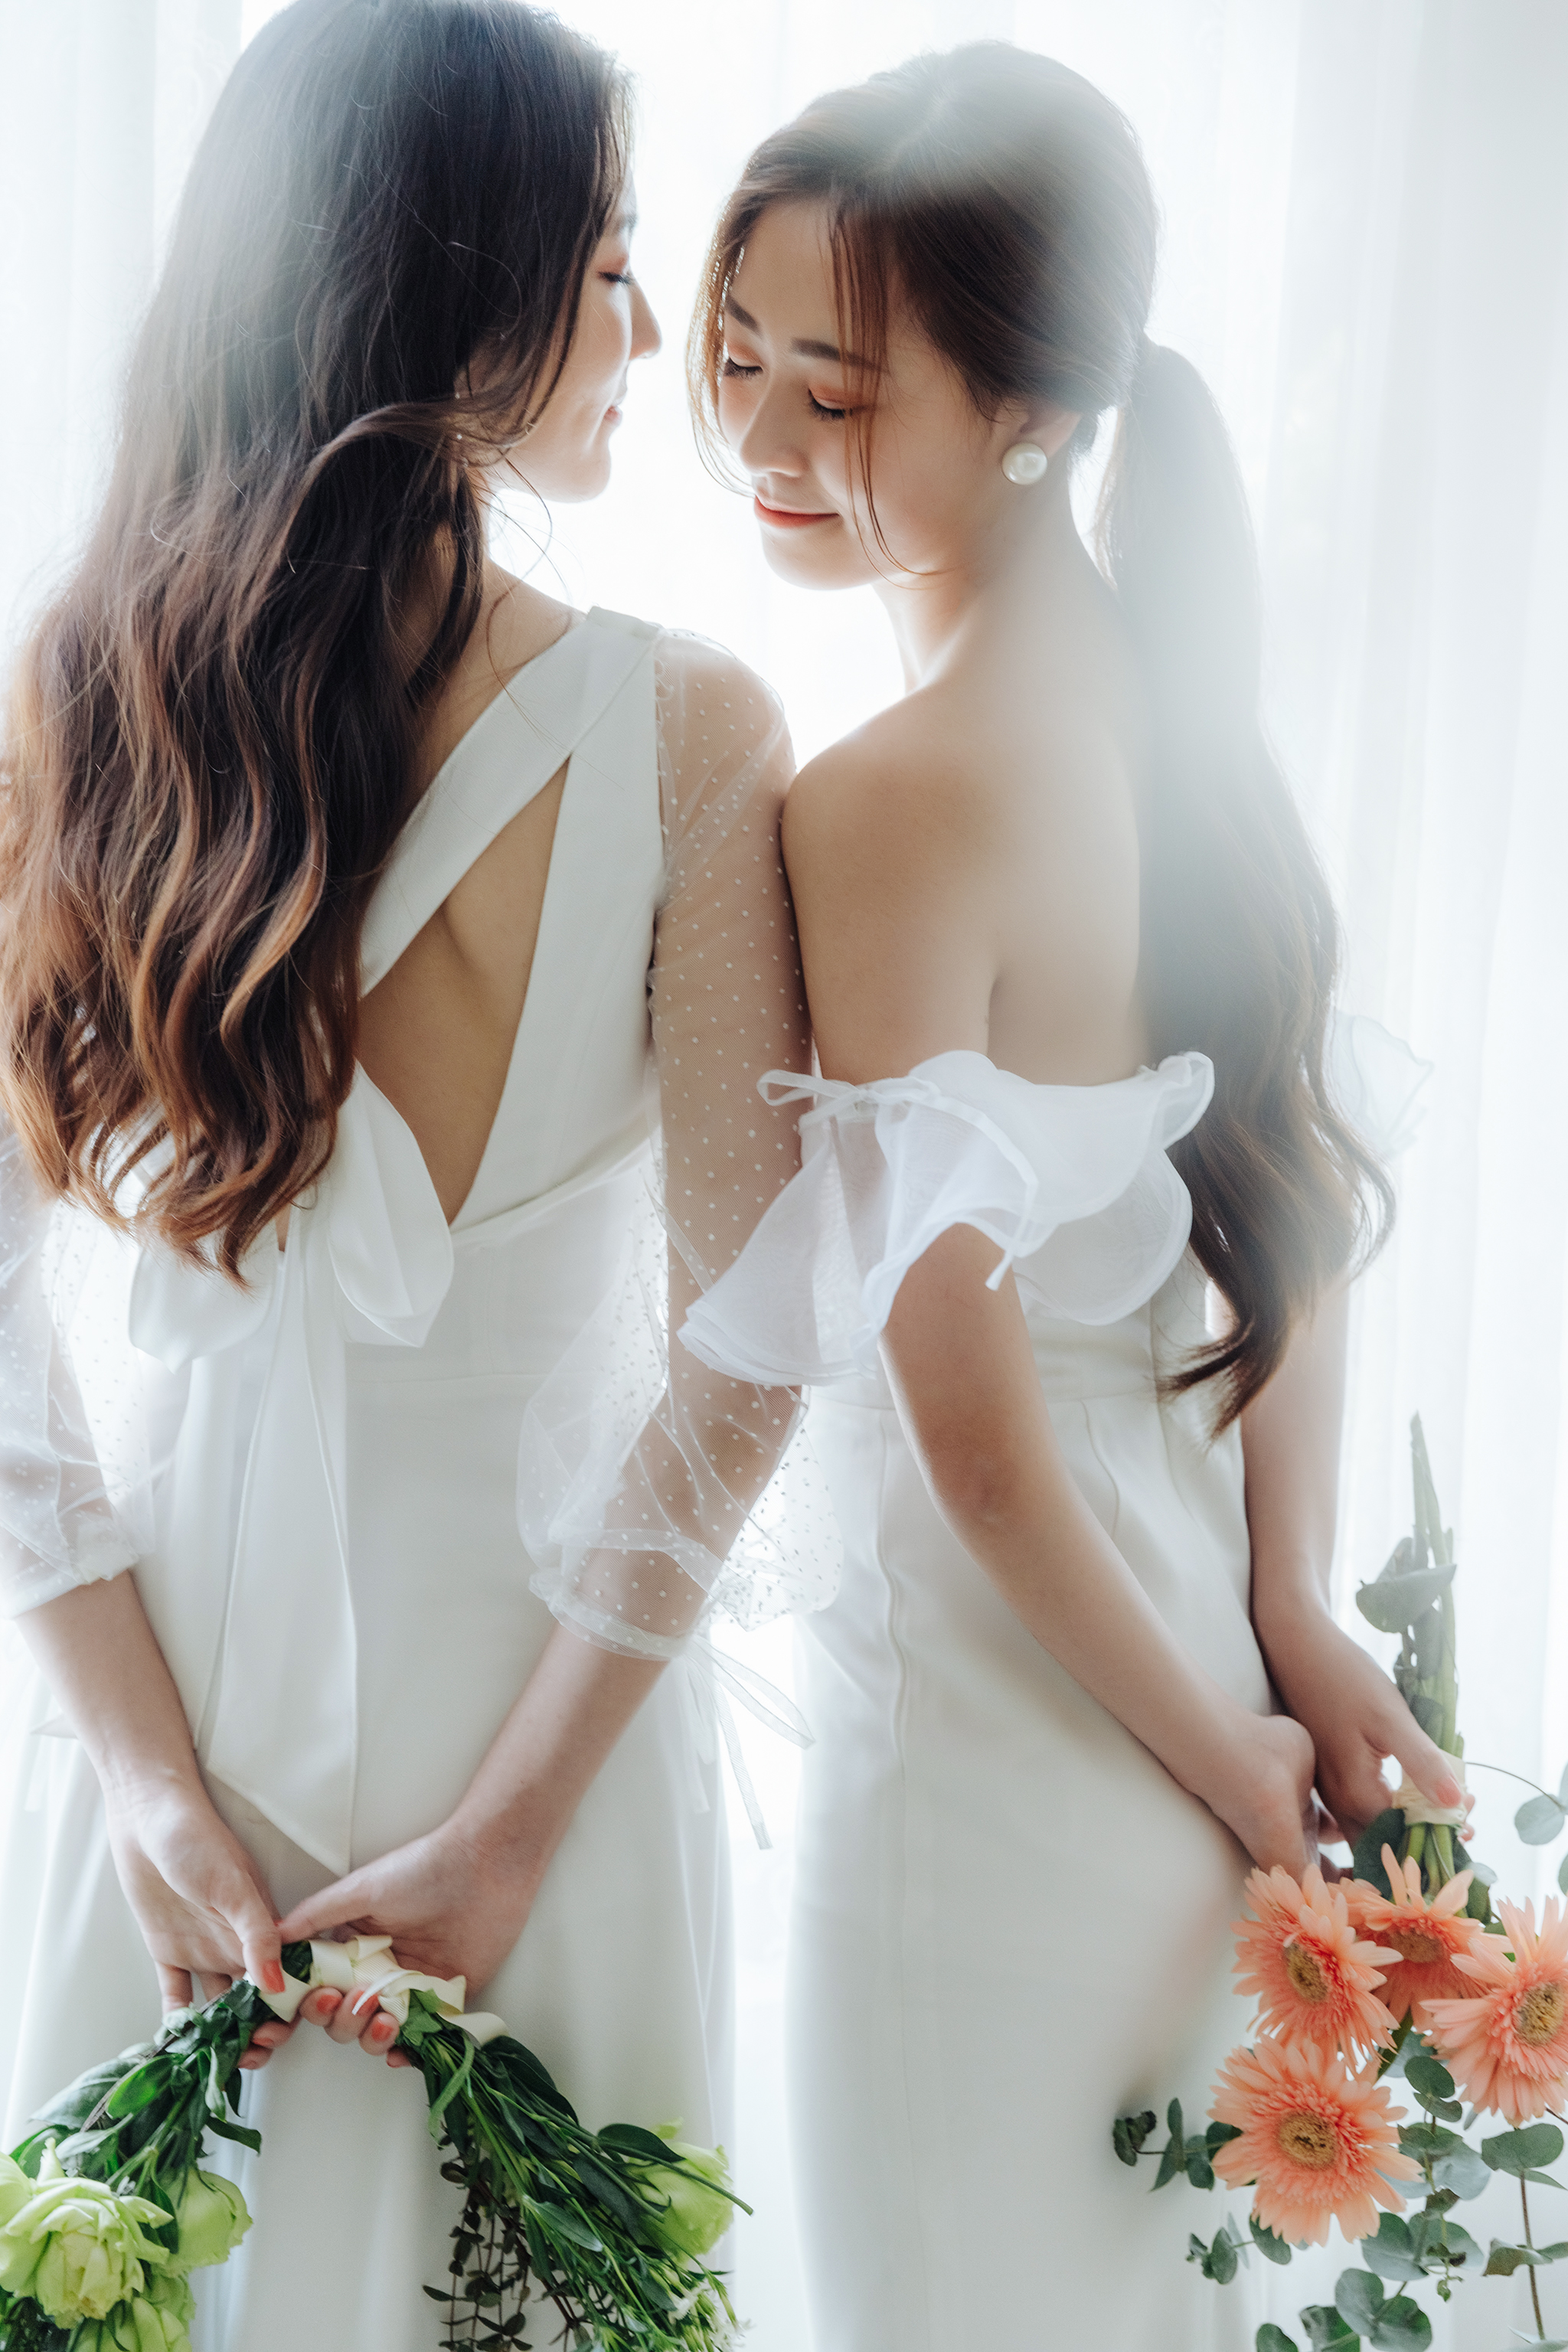 49929256646 422bf6461d o - 【閨蜜婚紗】+Jessy & Tiffany+